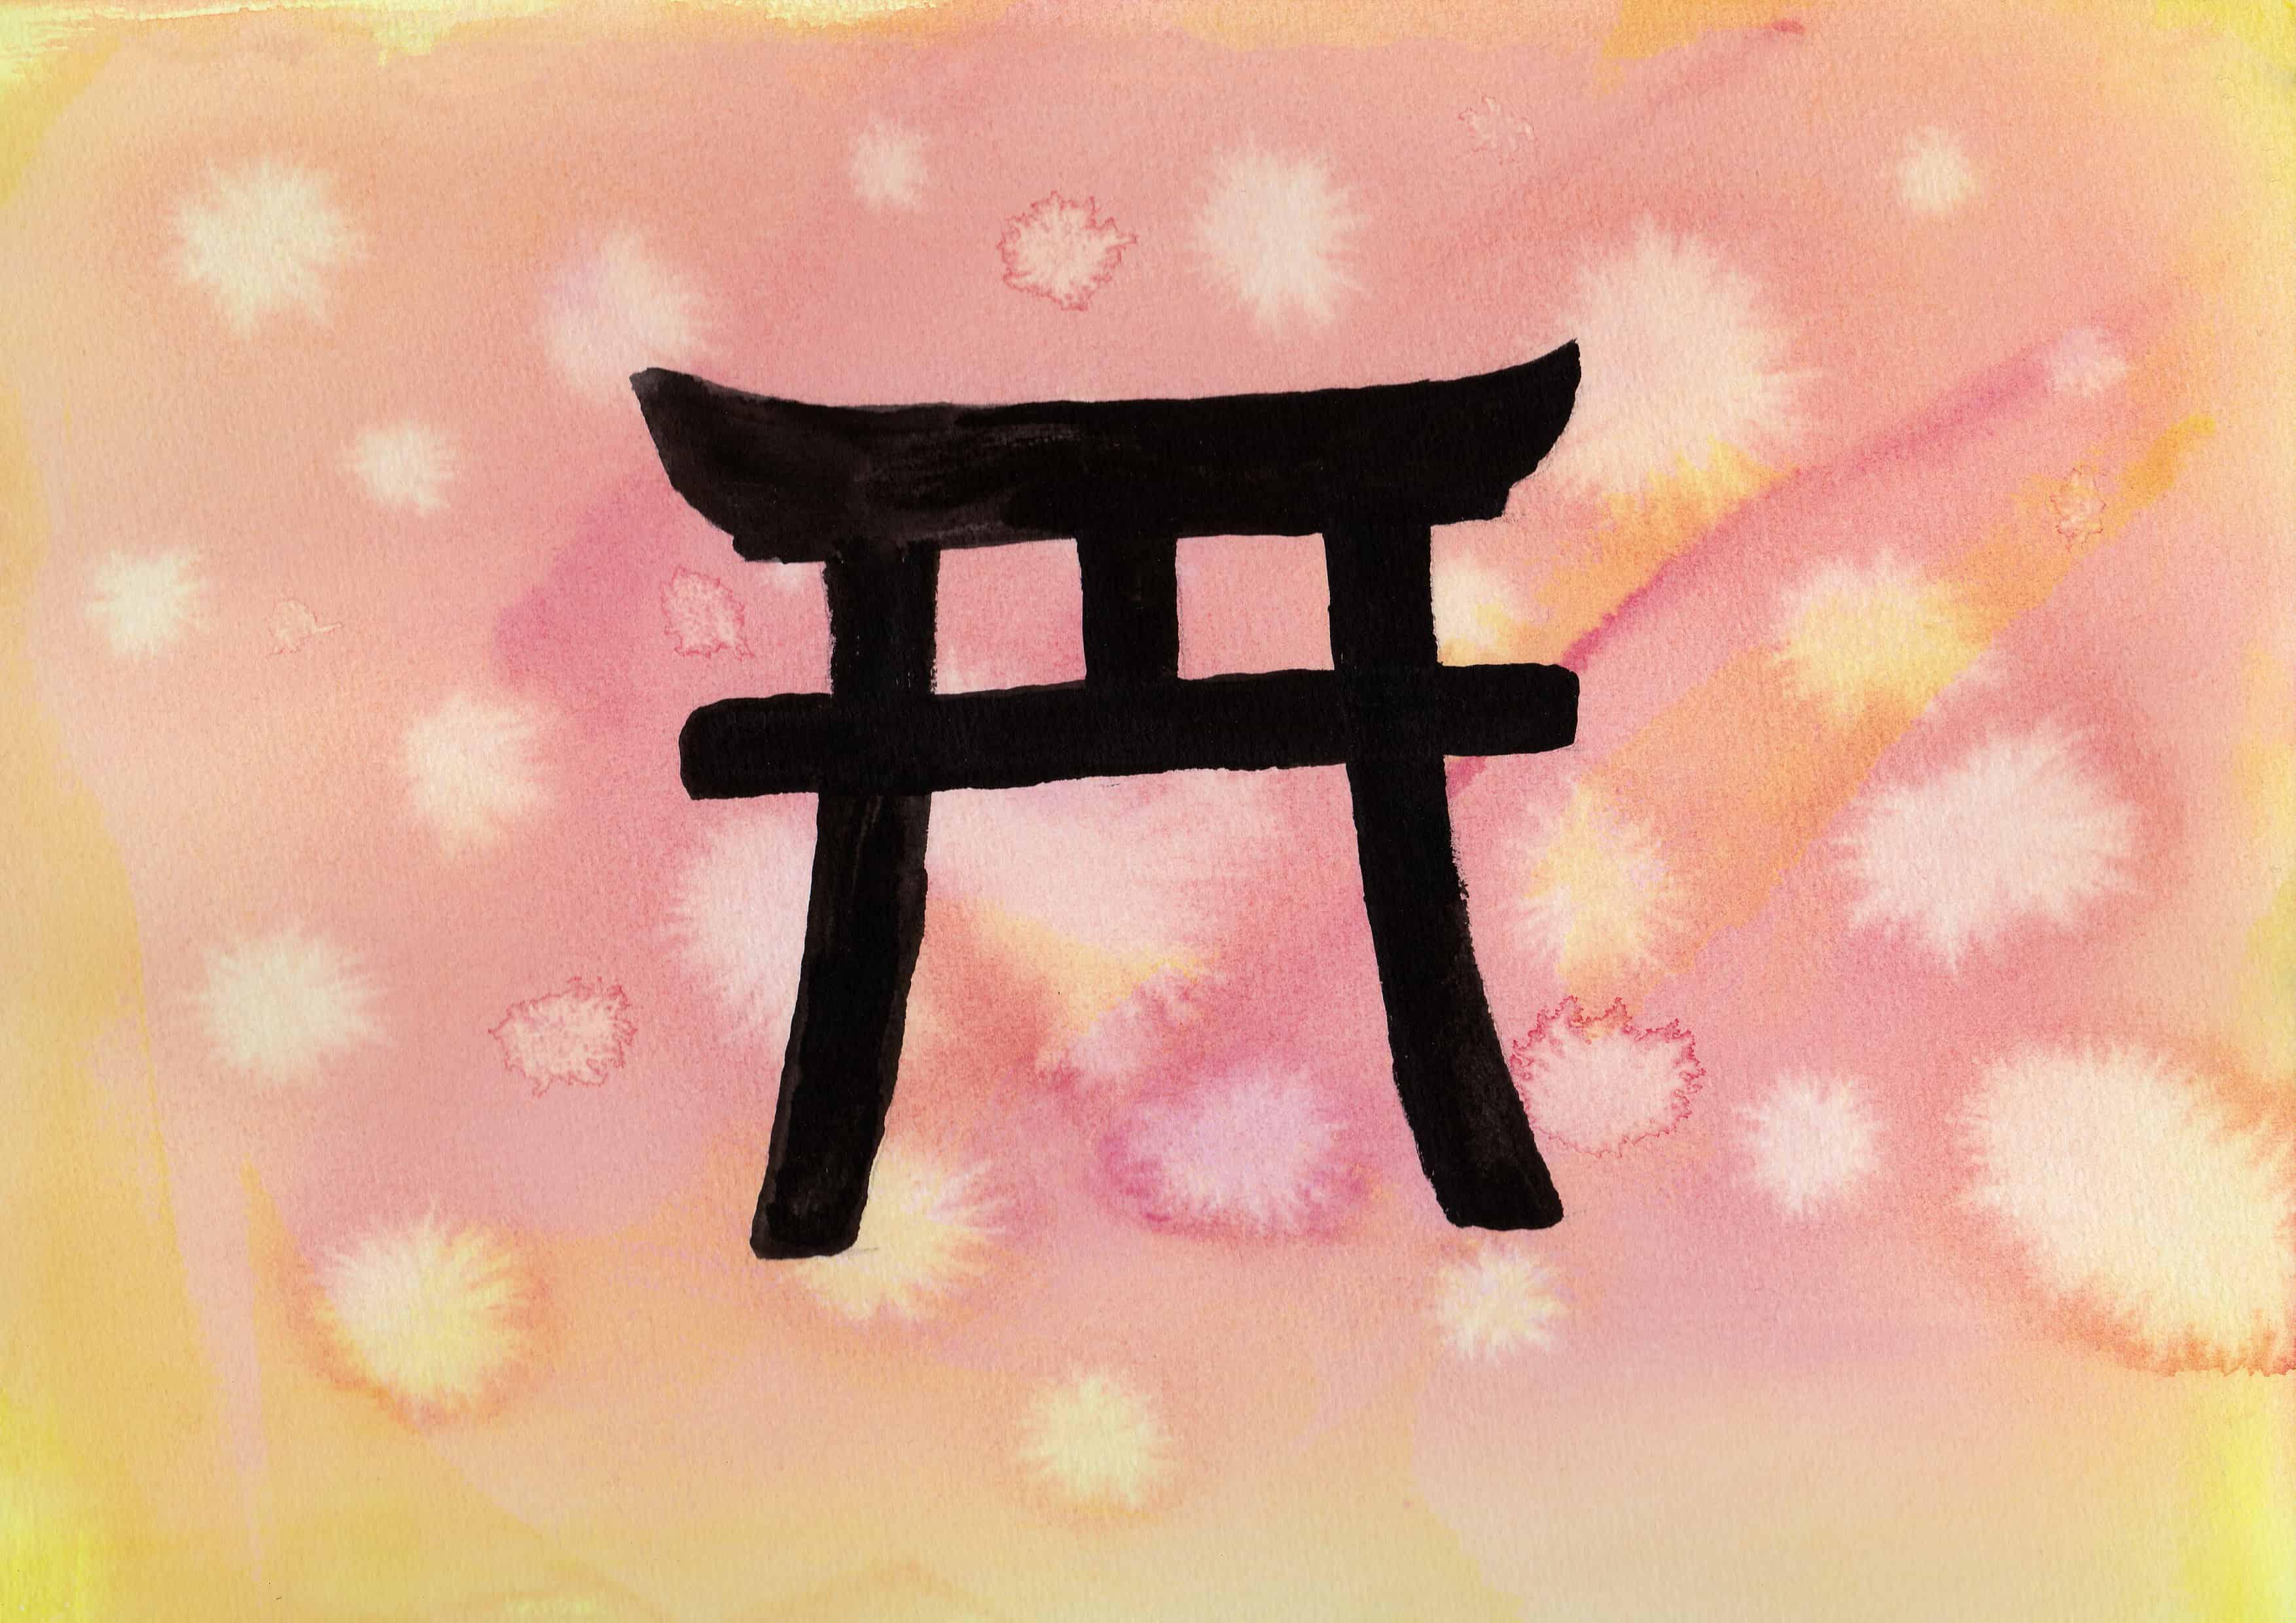 Torii Gate - 100 Sacred Symbols in Watercolour by Linda Ursin